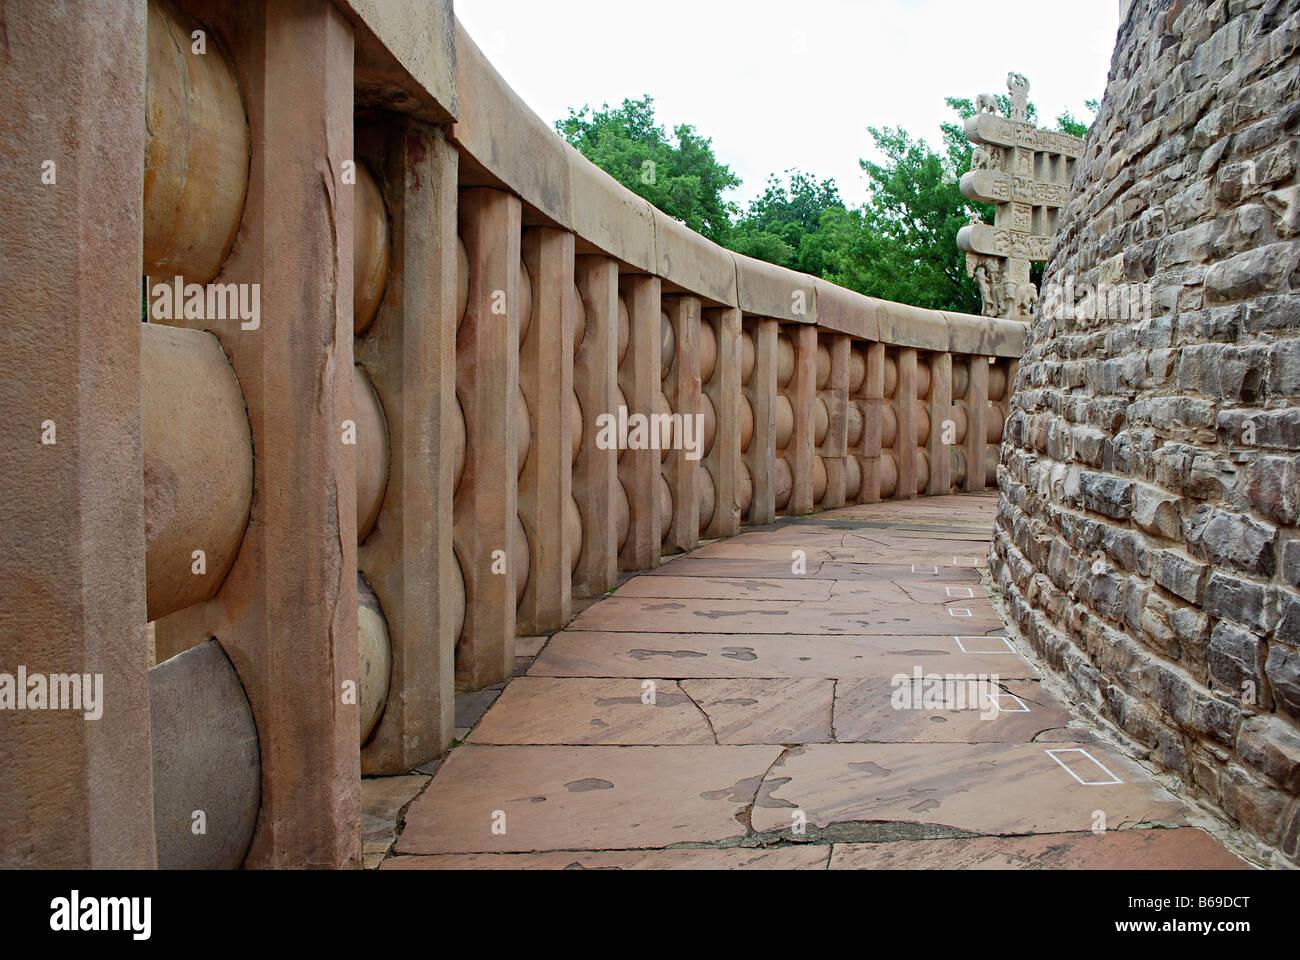 Stupa 1 or Great Stupa : Balustrade , Sanchi, Madhya Pradesh, India. - Stock Image